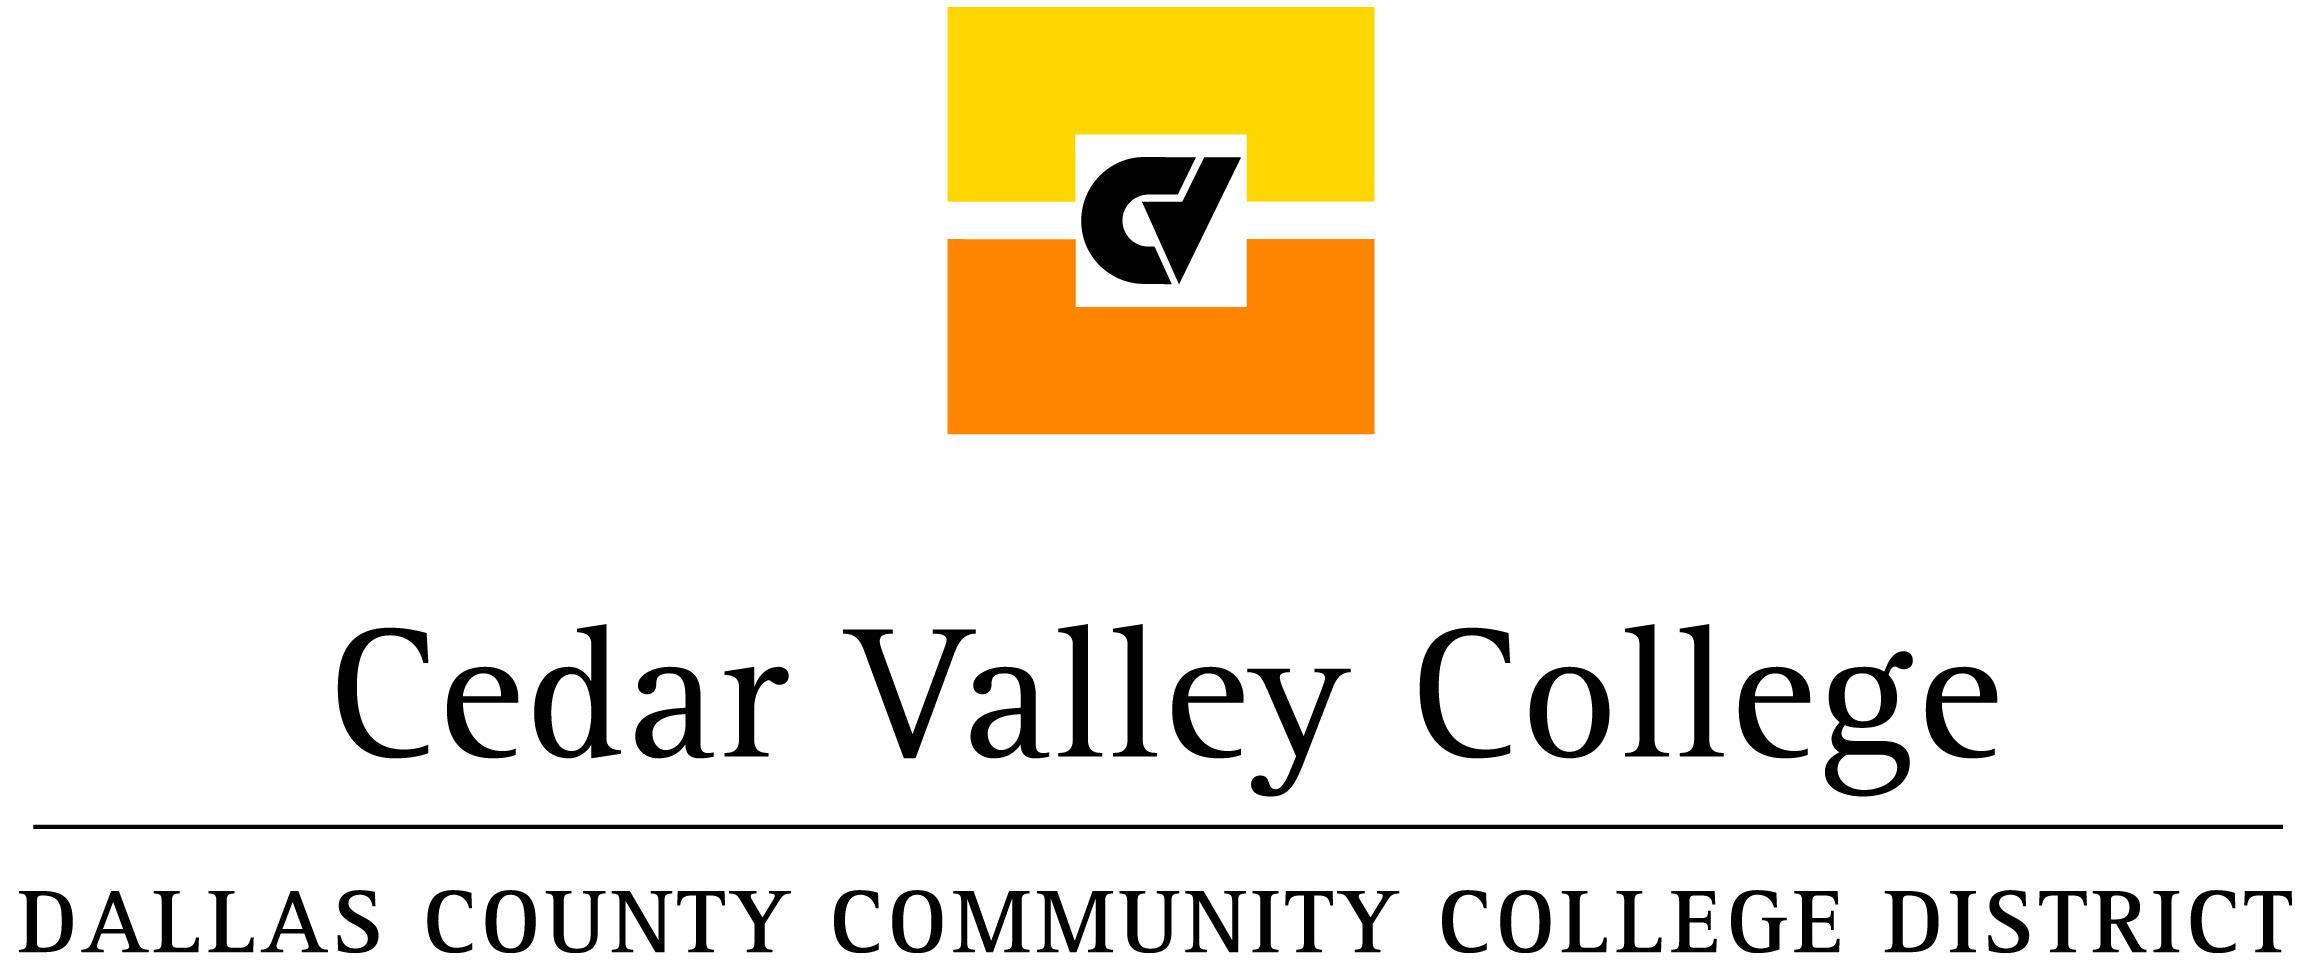 Cedar Valley College - Wikipedia